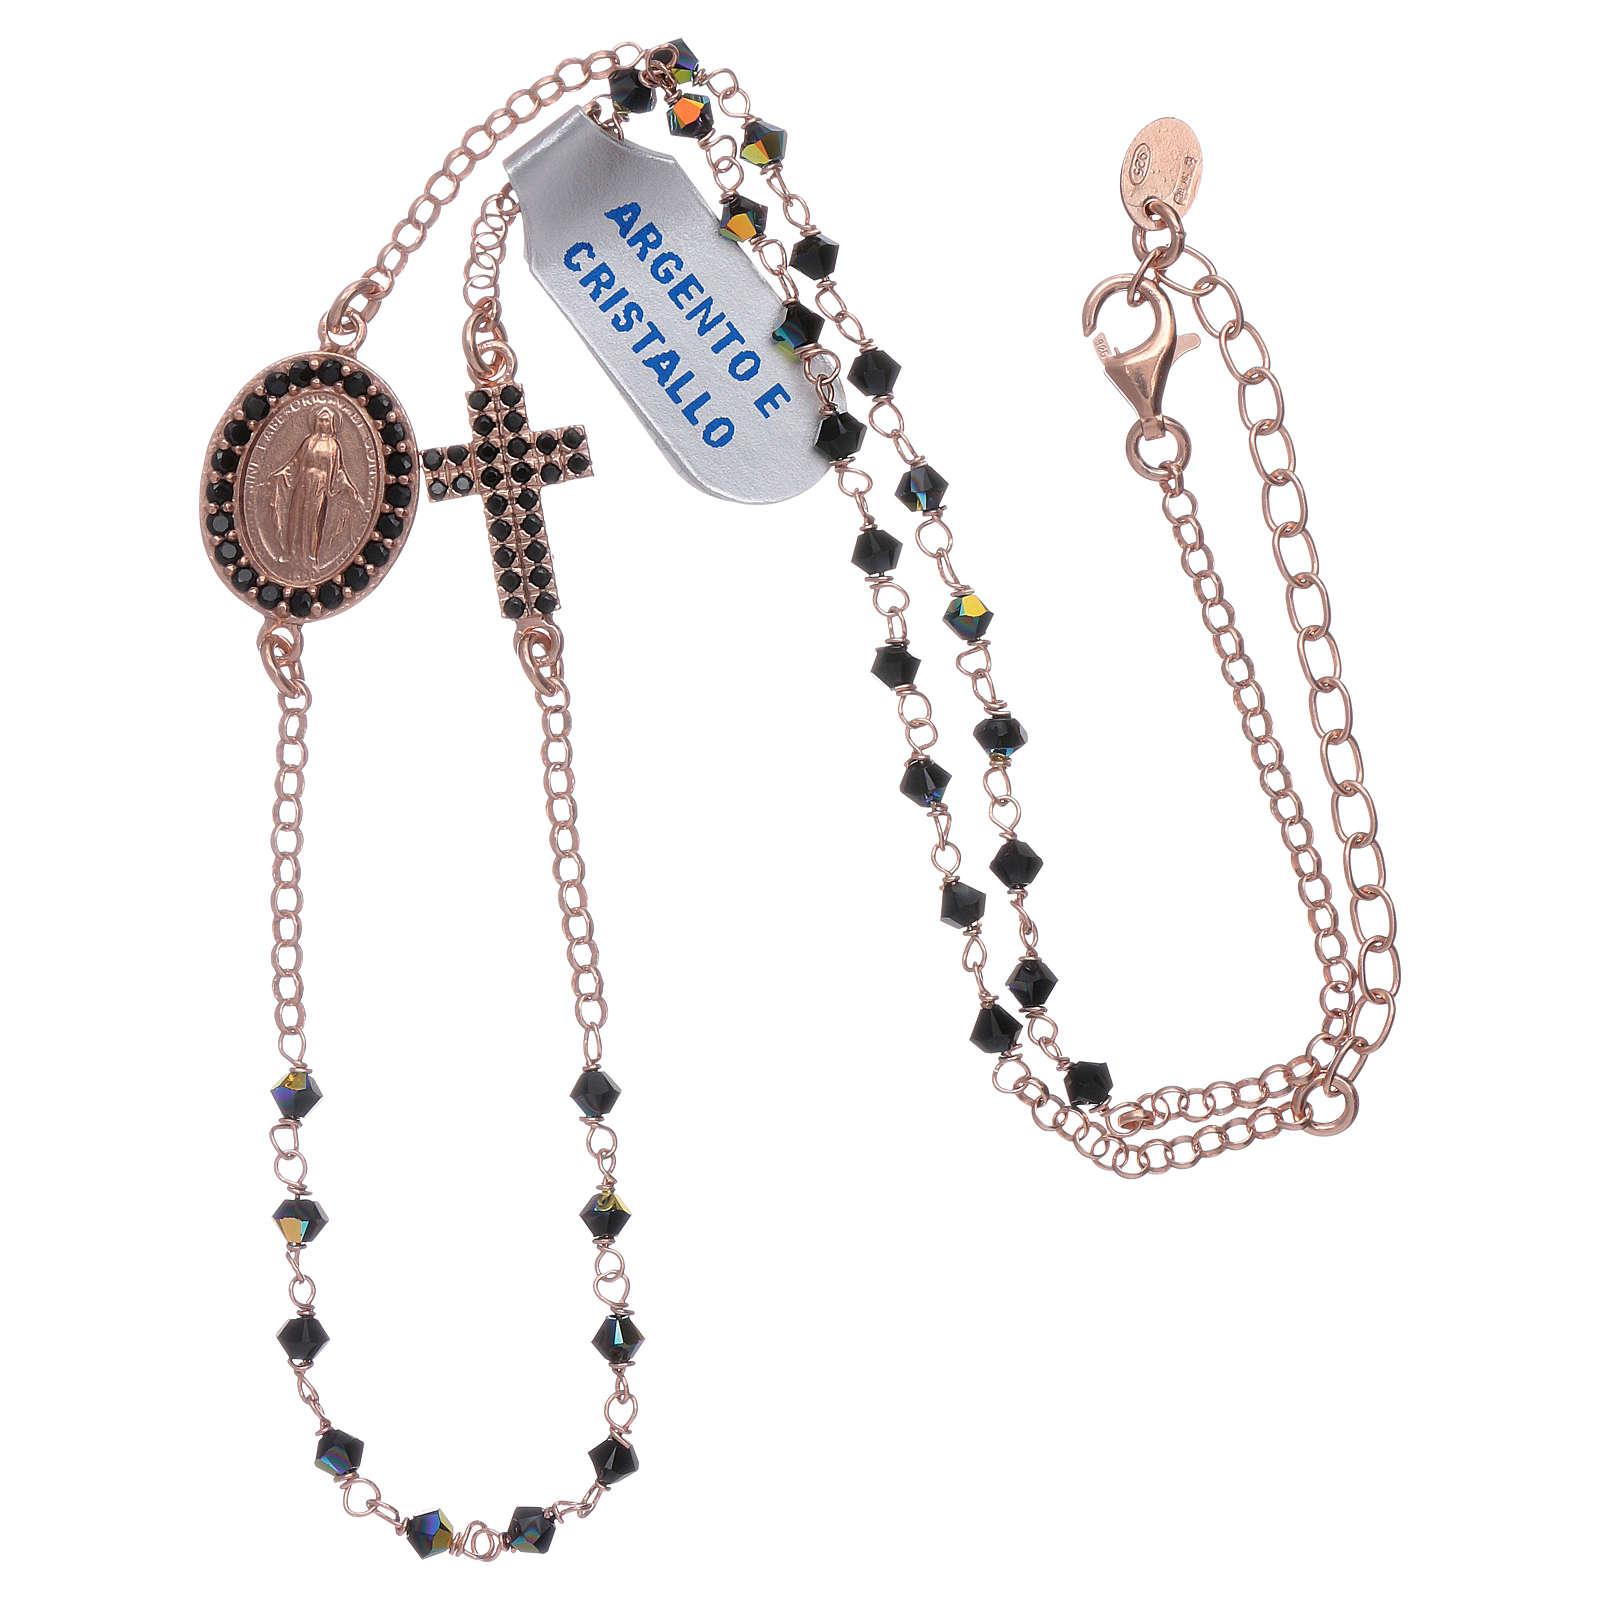 Collar medalla Milagrosa cruz zircones plata 925 rosada 4